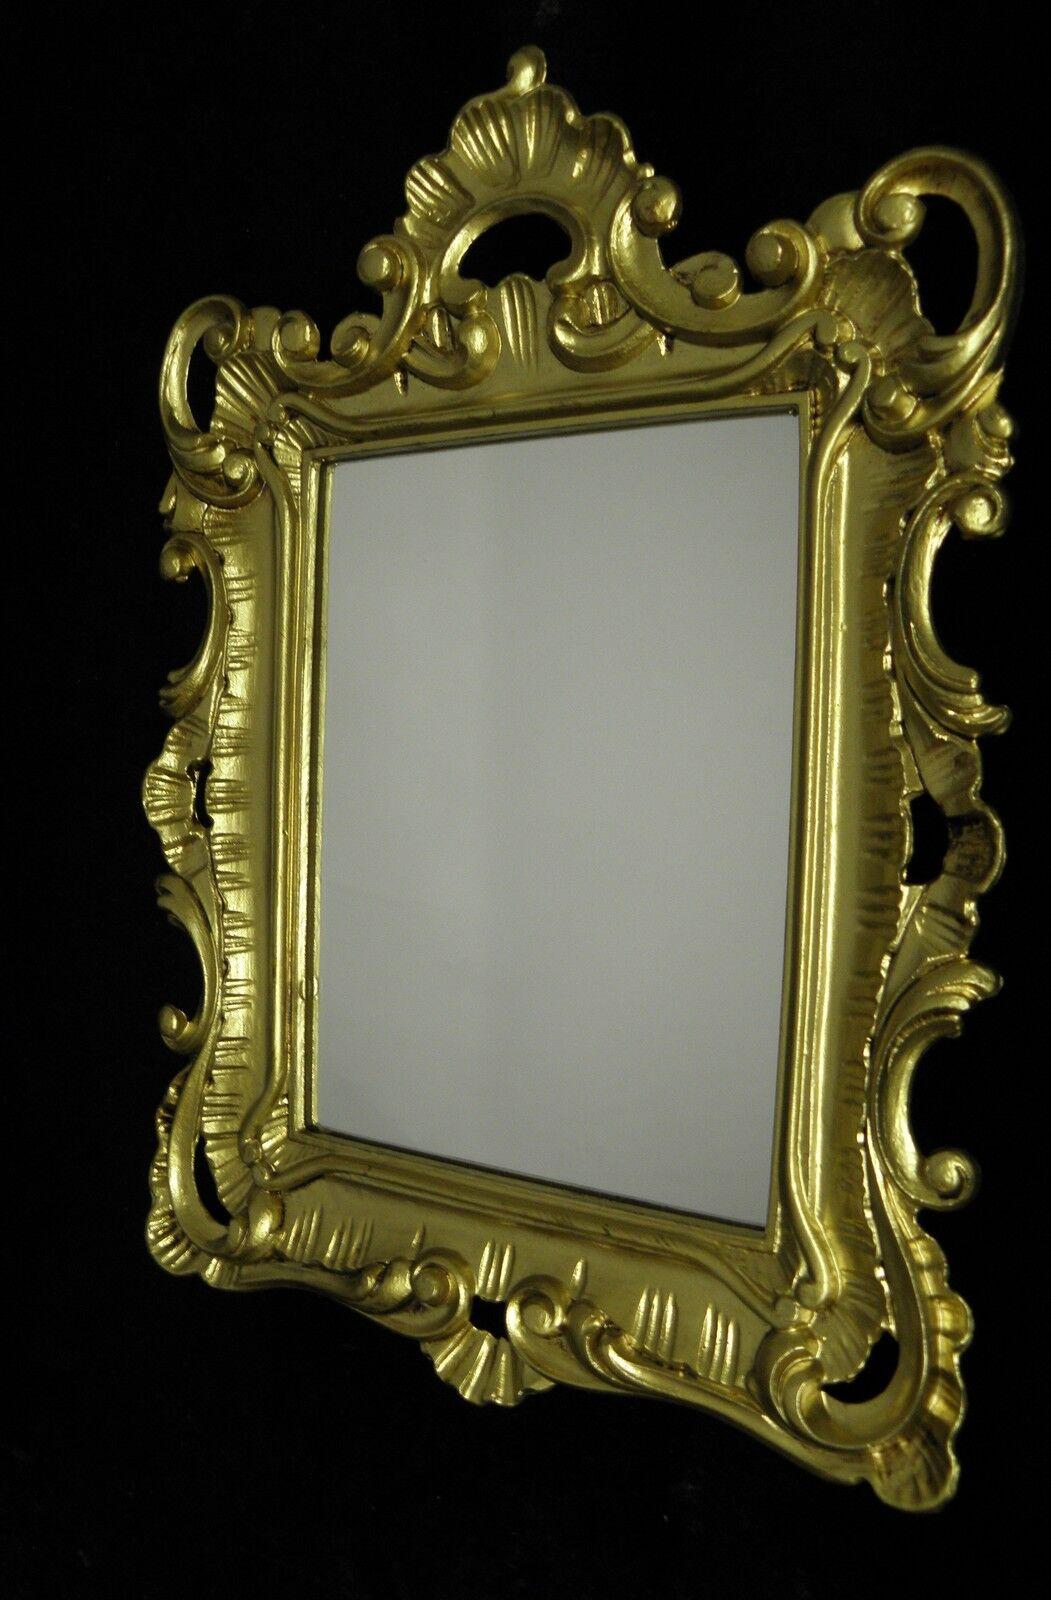 Wandspiegel Spiegel 41x28 Rahmen BAROCK Antik Rokoko GOLD Homedeko ...